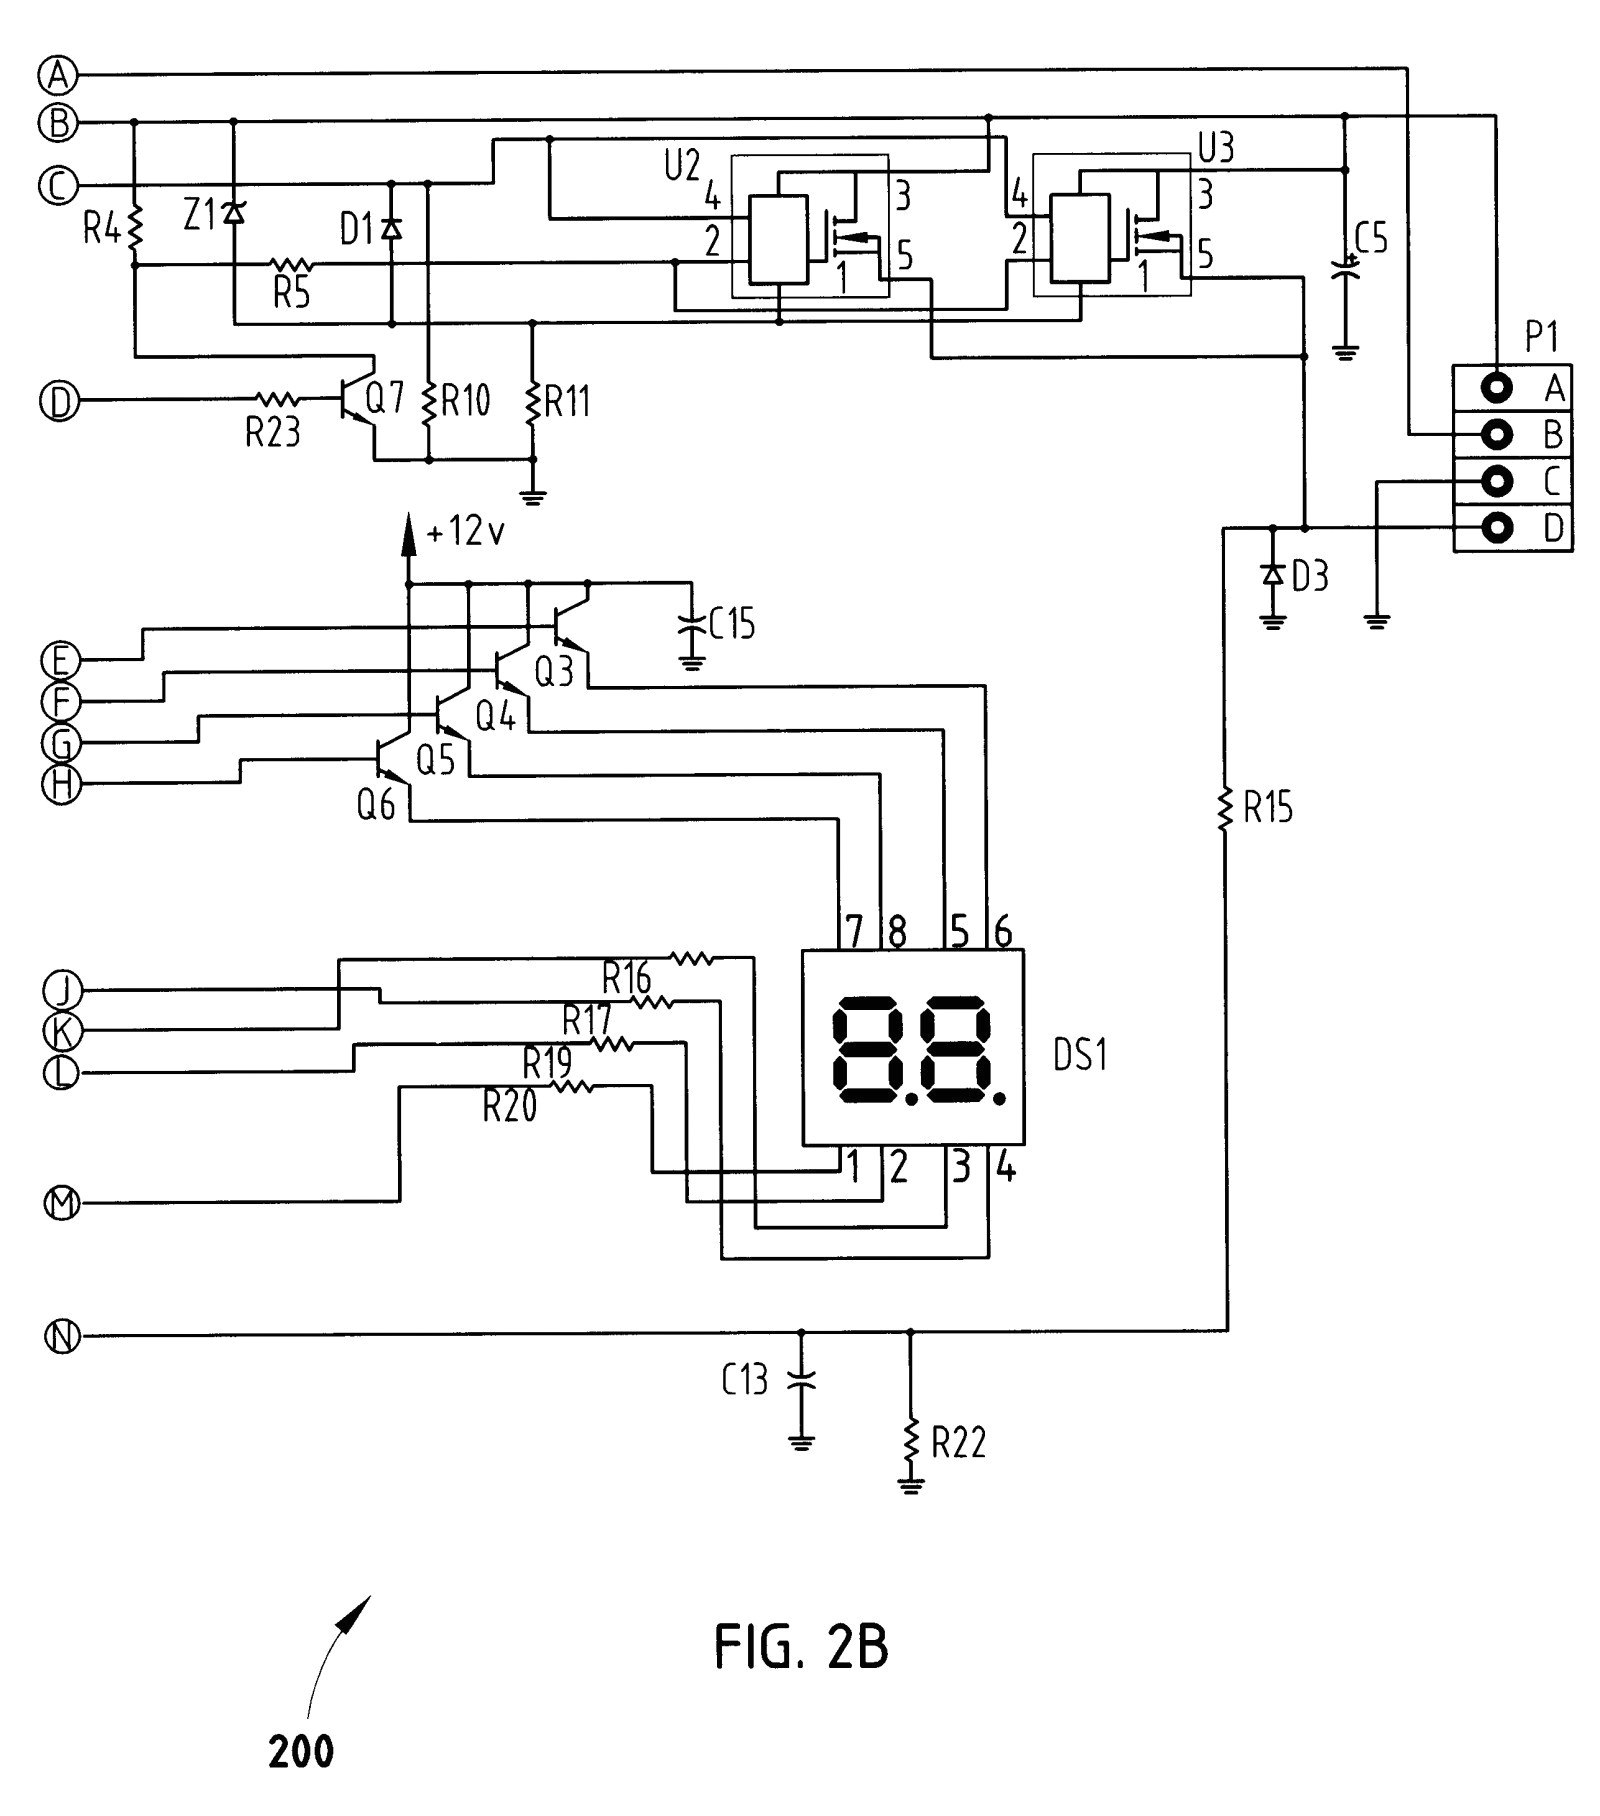 curt brake controller wiring diagram wiring diagram for trailer brake controller new hopkins brake controller wiring diagram electrics schematic for curt 8b jpg